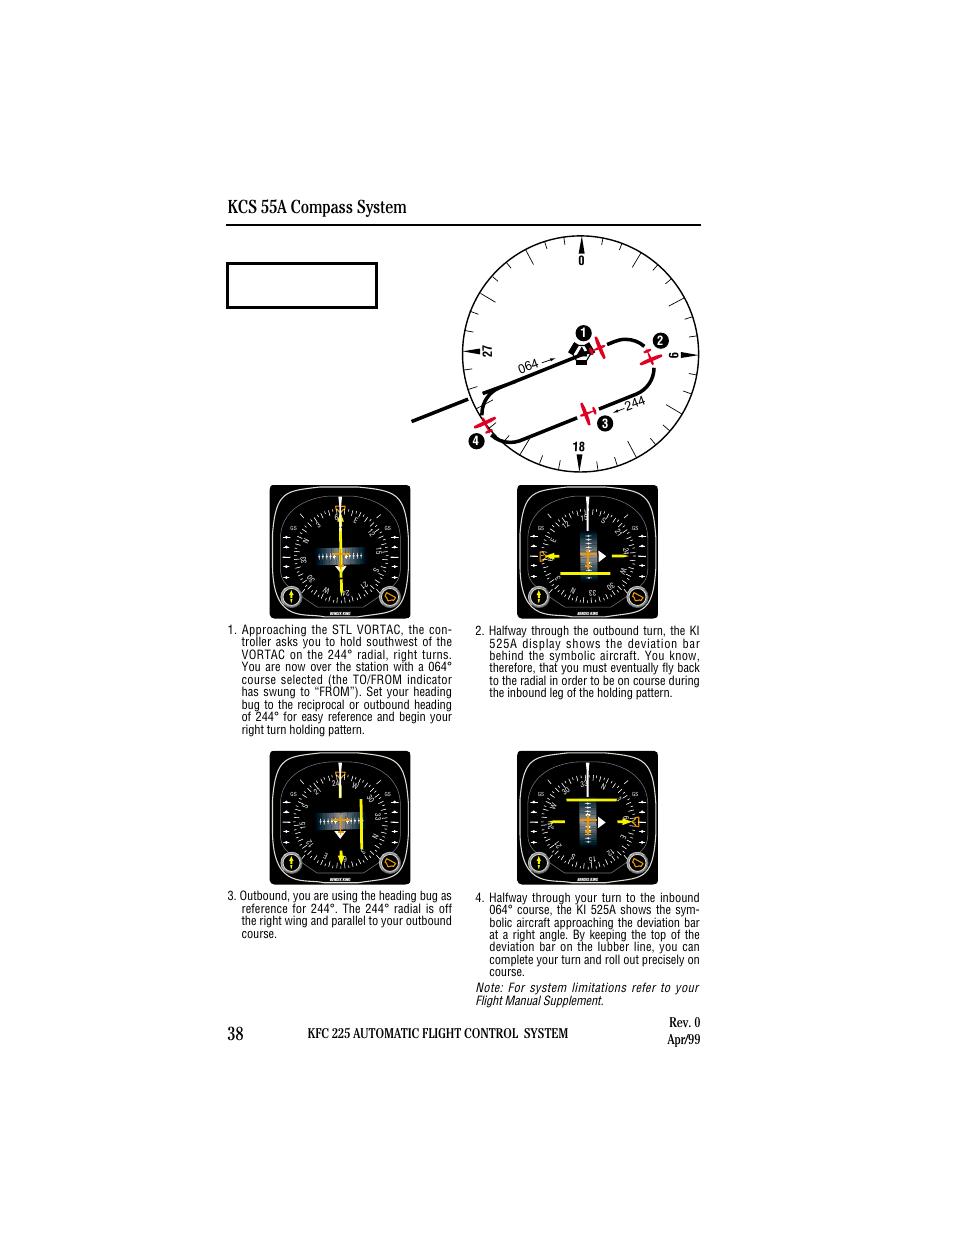 kcs 55a compass system 38 holding pattern bendixking ki 525a rh manualsdir com Bendix King Radio Schematic Bendix King KX 125